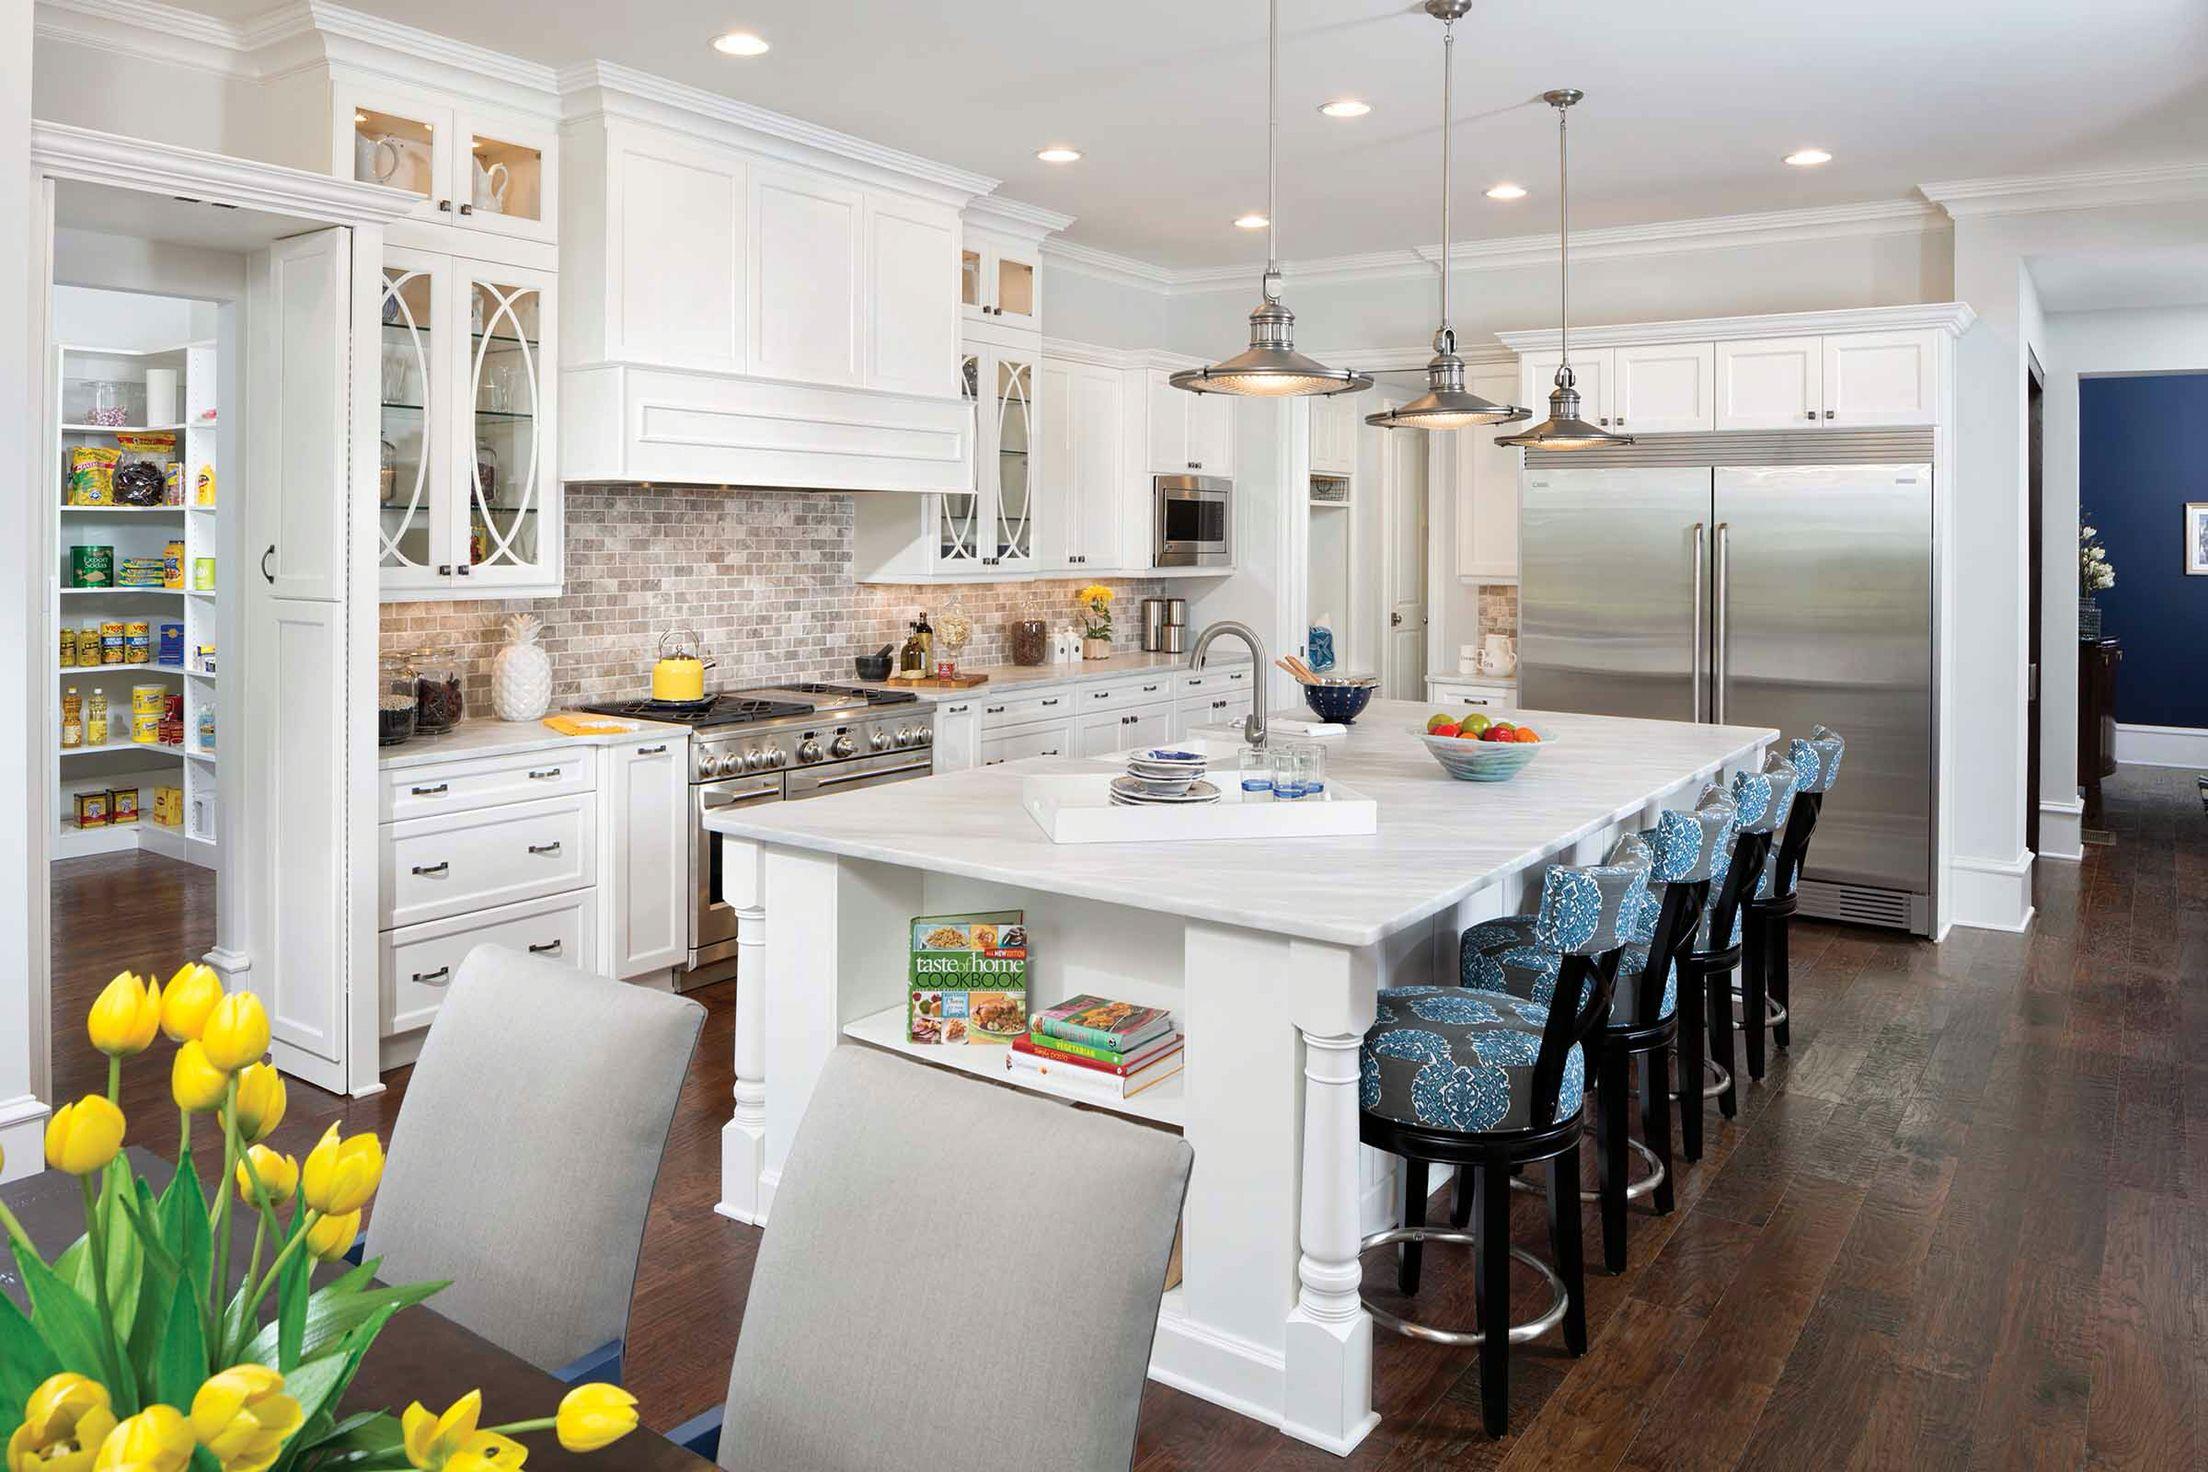 Kitchen  Ar Model  Kitchen  Pinterest  Kitchen Design And Kitchens Beauteous Model Kitchen Designs Inspiration